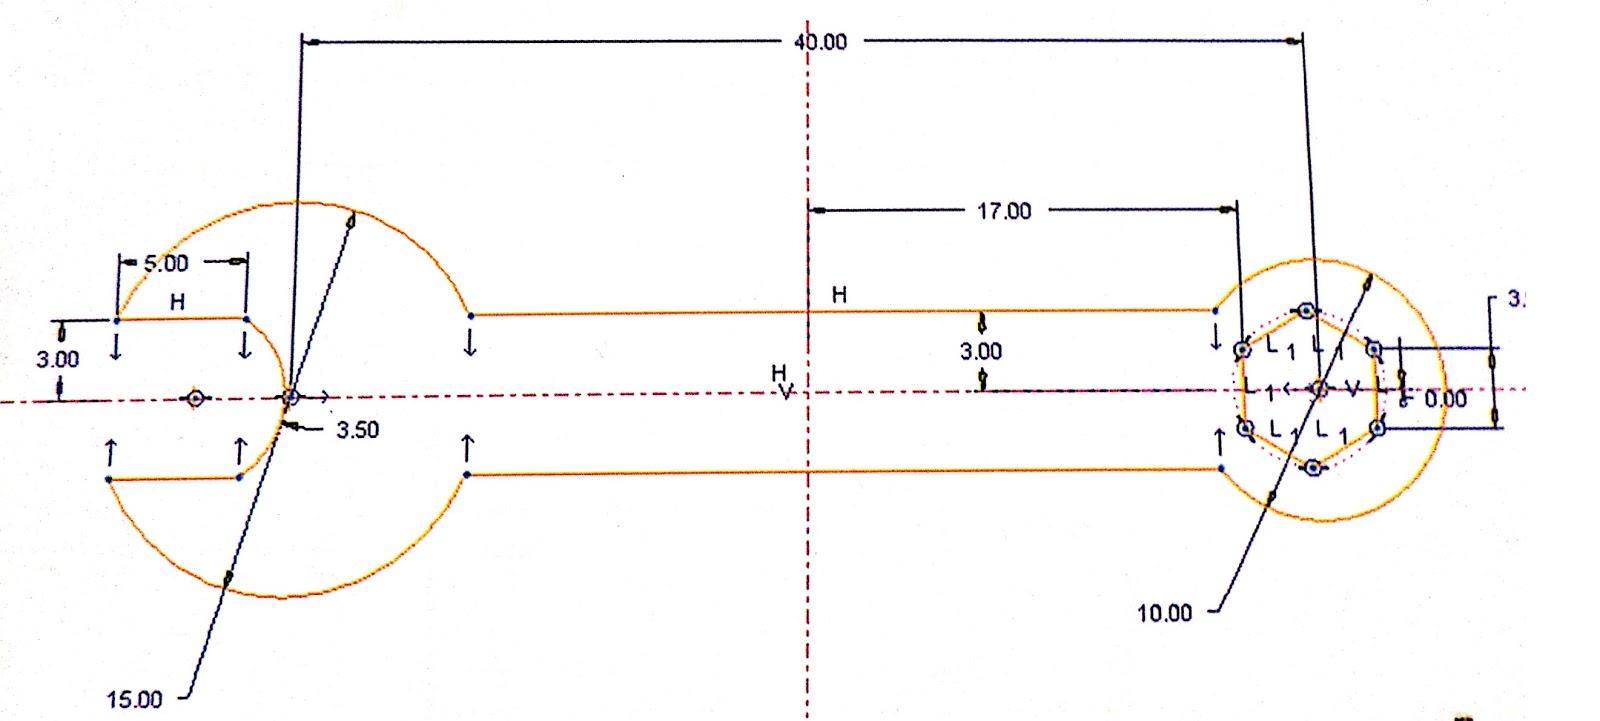 creo 3.0 drawing tutorial pdf